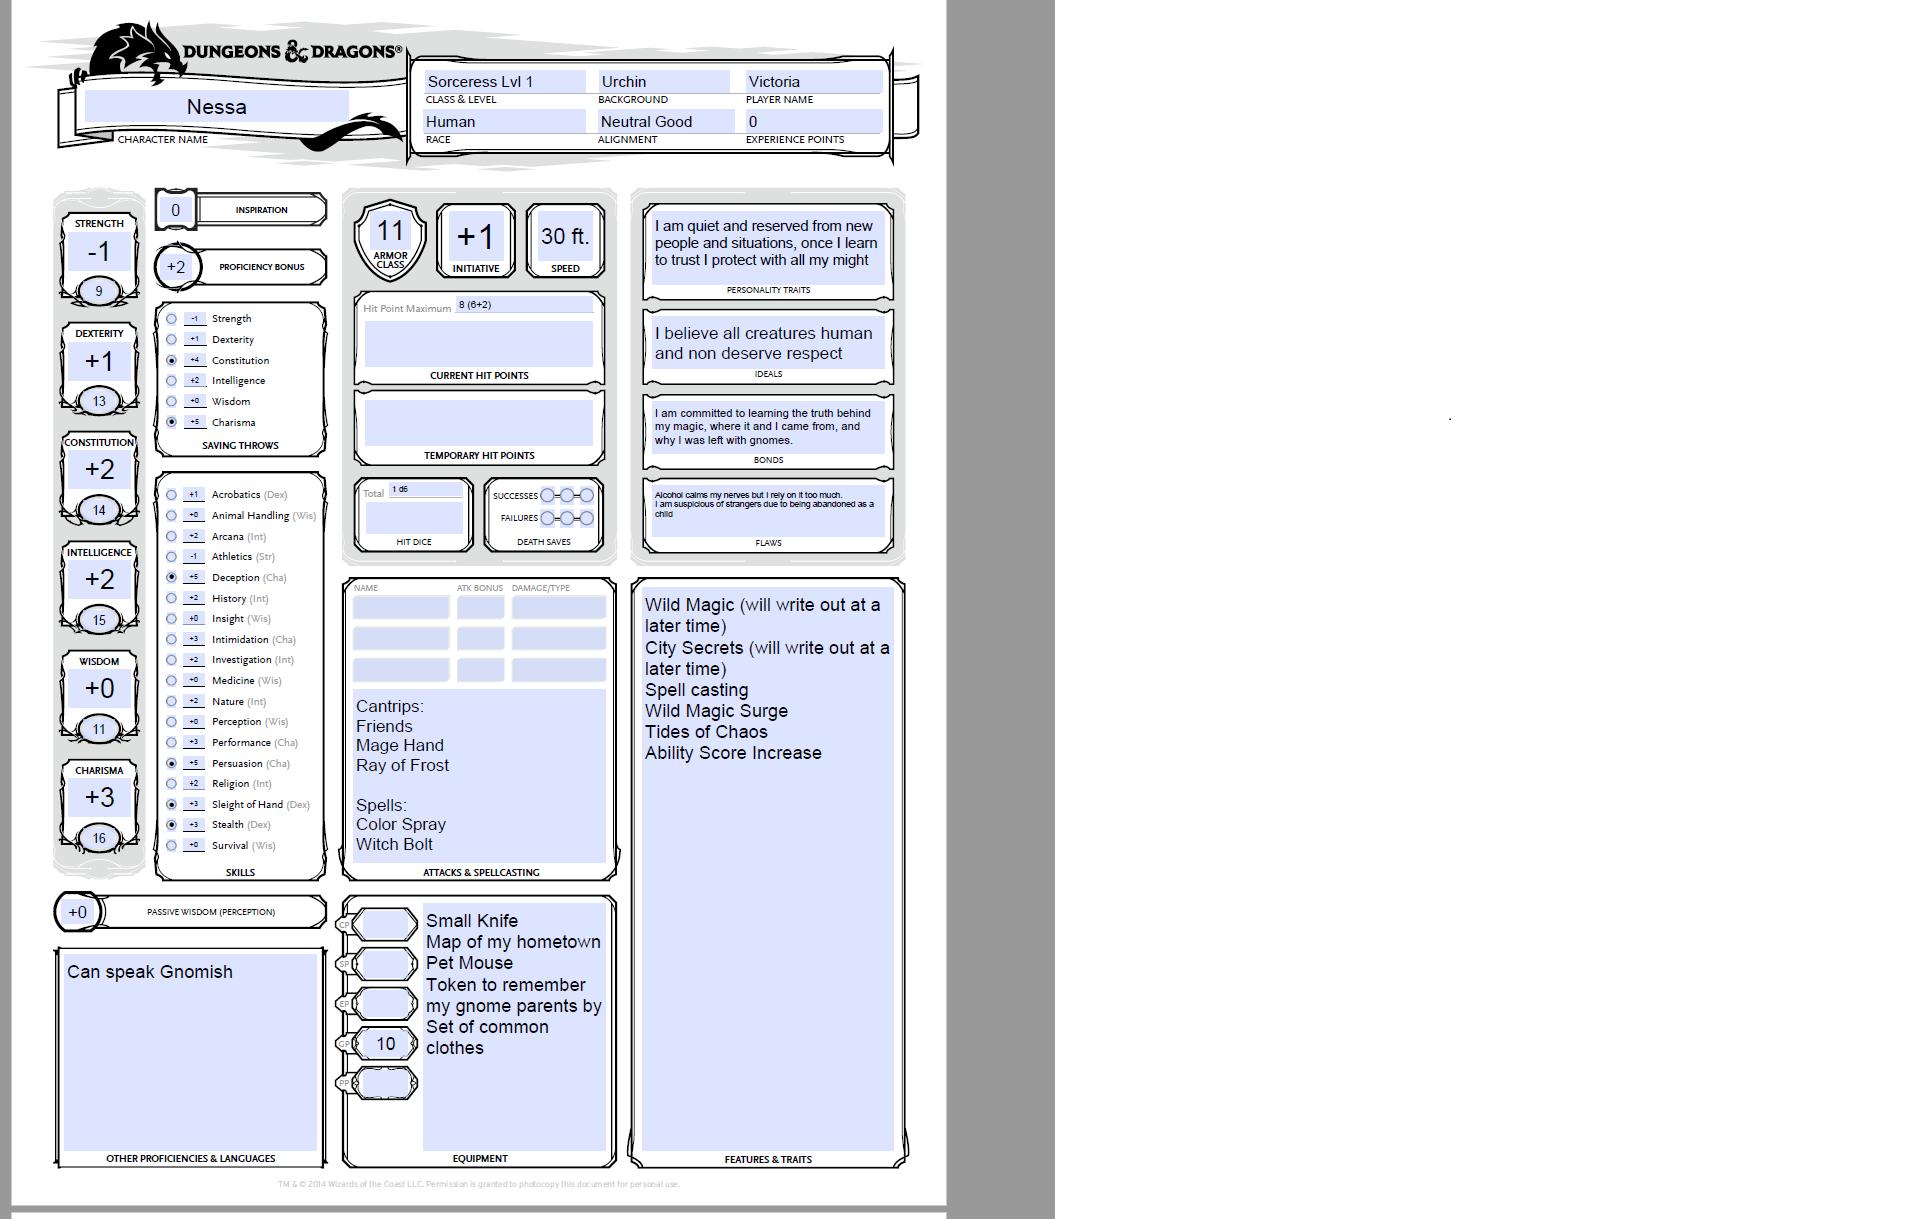 Nessa_Character_Sheet.png